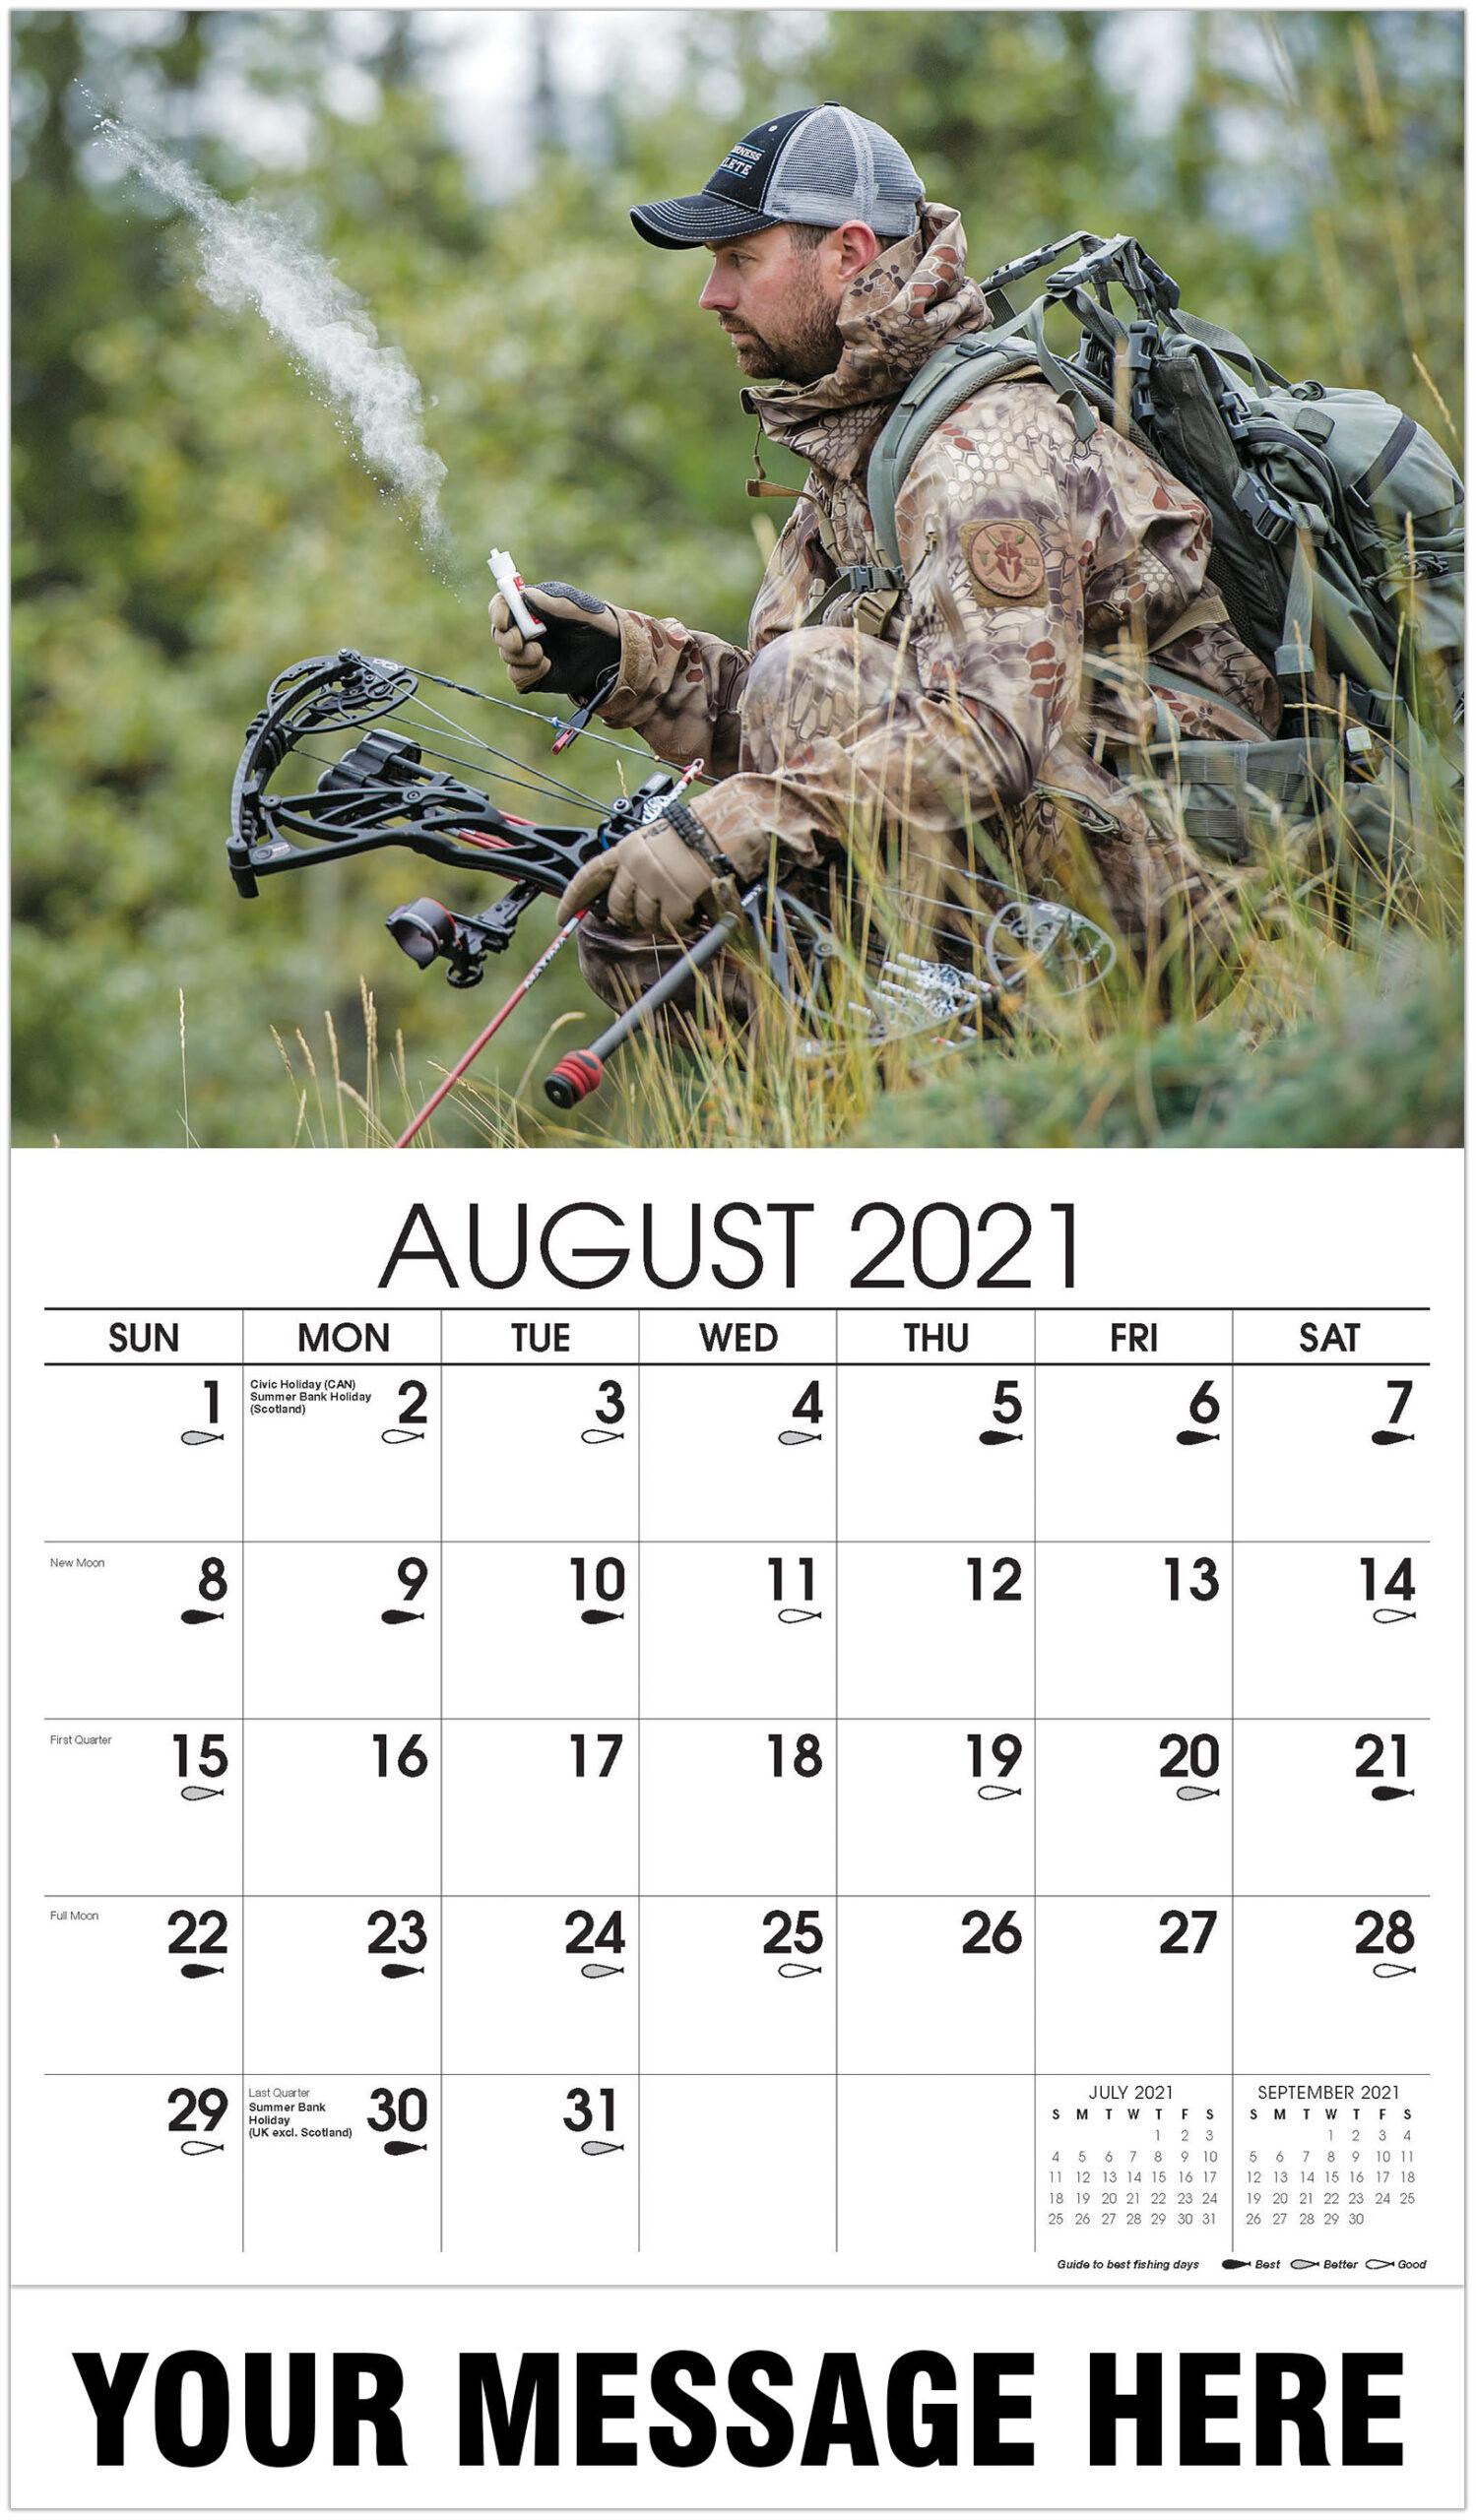 Fishing & Hunting with Hunting Calendar 2021